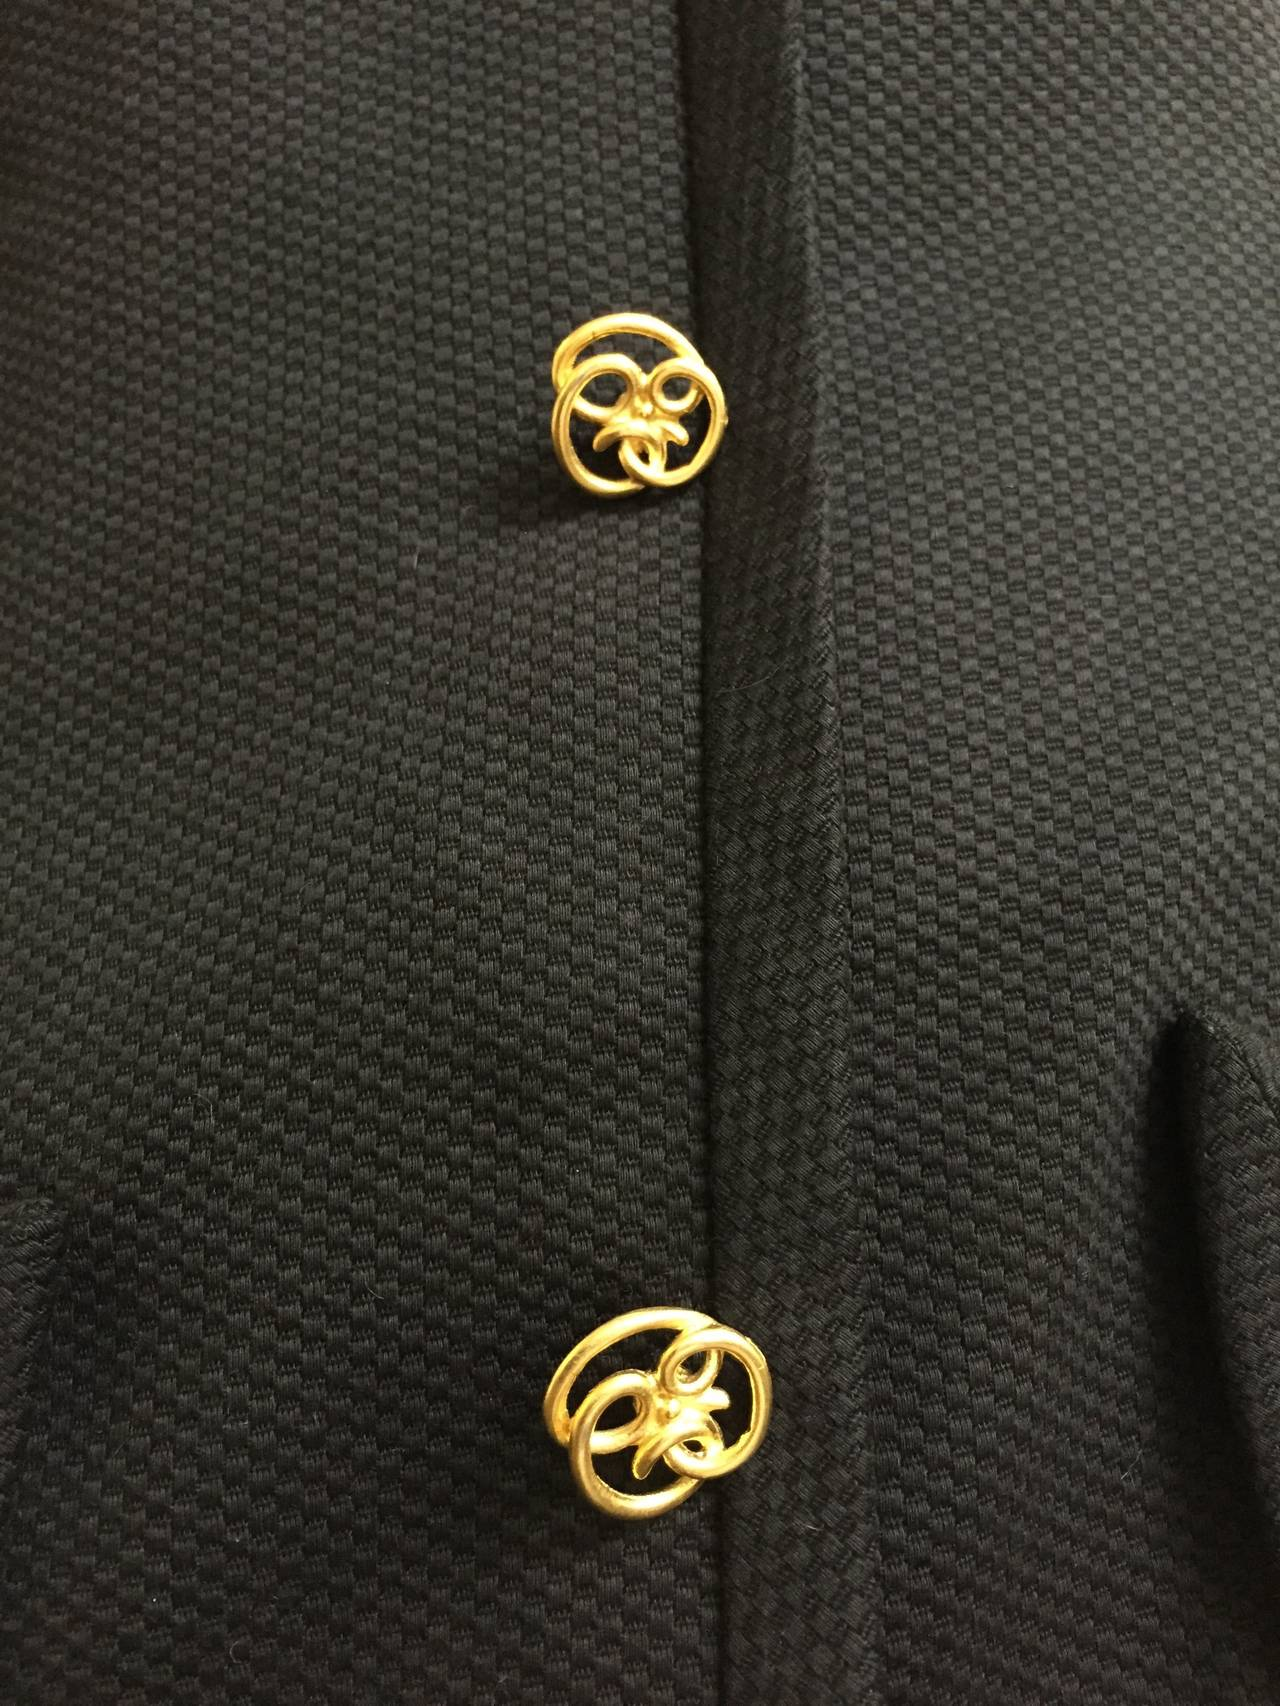 Bill Blass 90s Black Strapless Dress With Pockets Size 4. 4